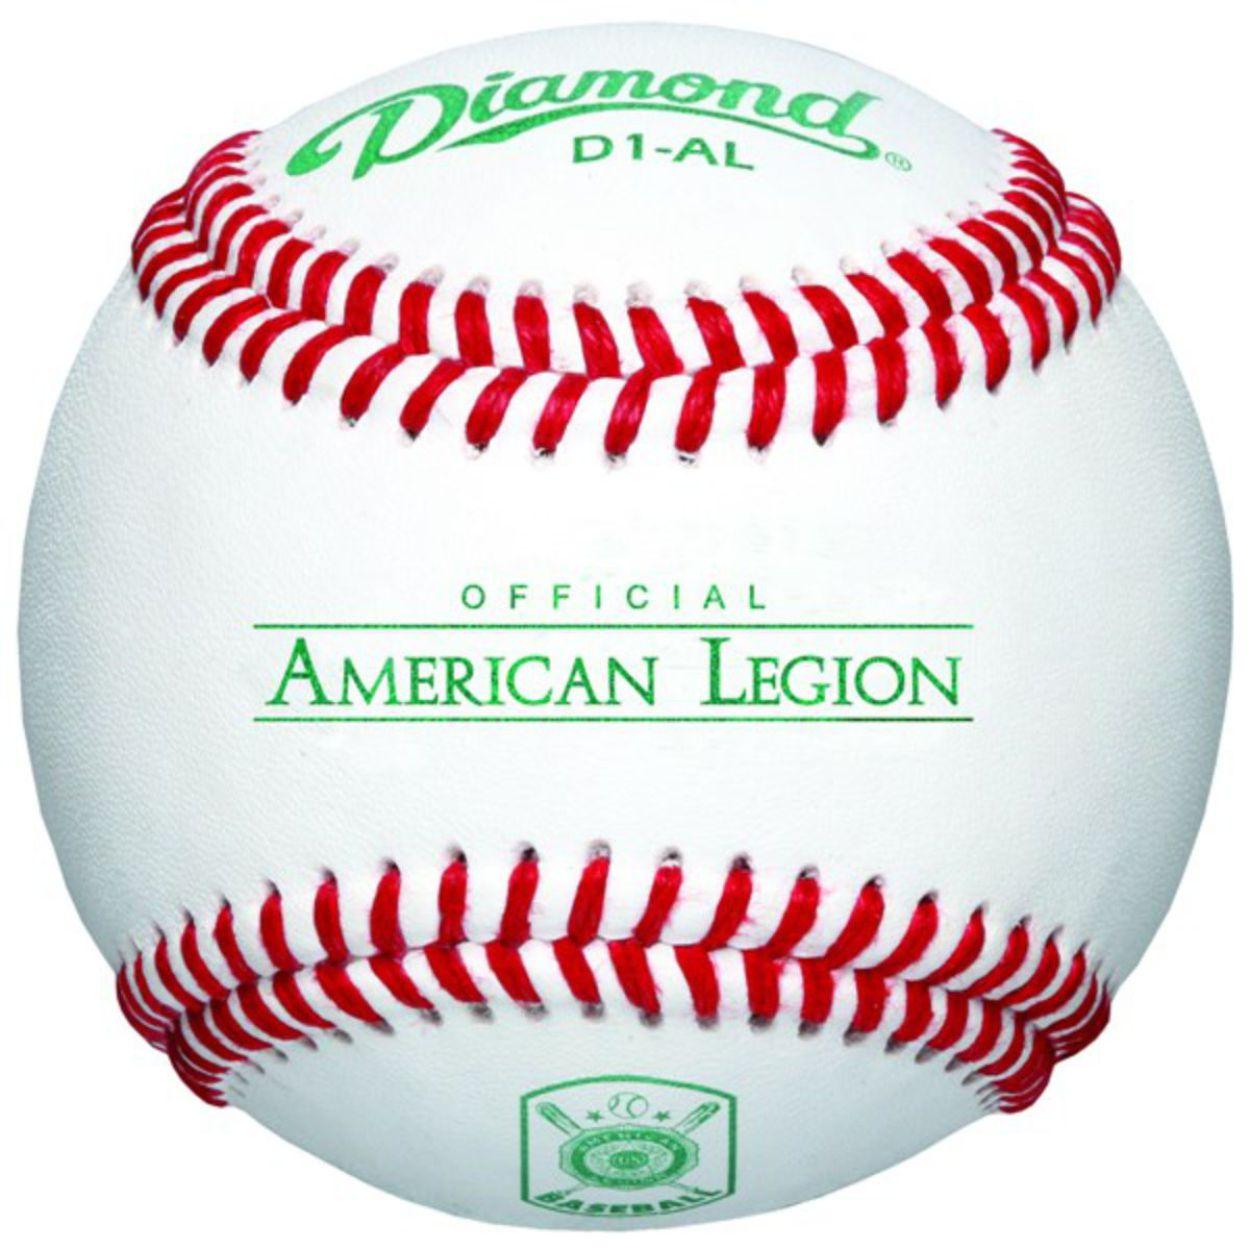 DIAMOND D1-AL EMBLEM AMERICAN LEGION BASEBALL